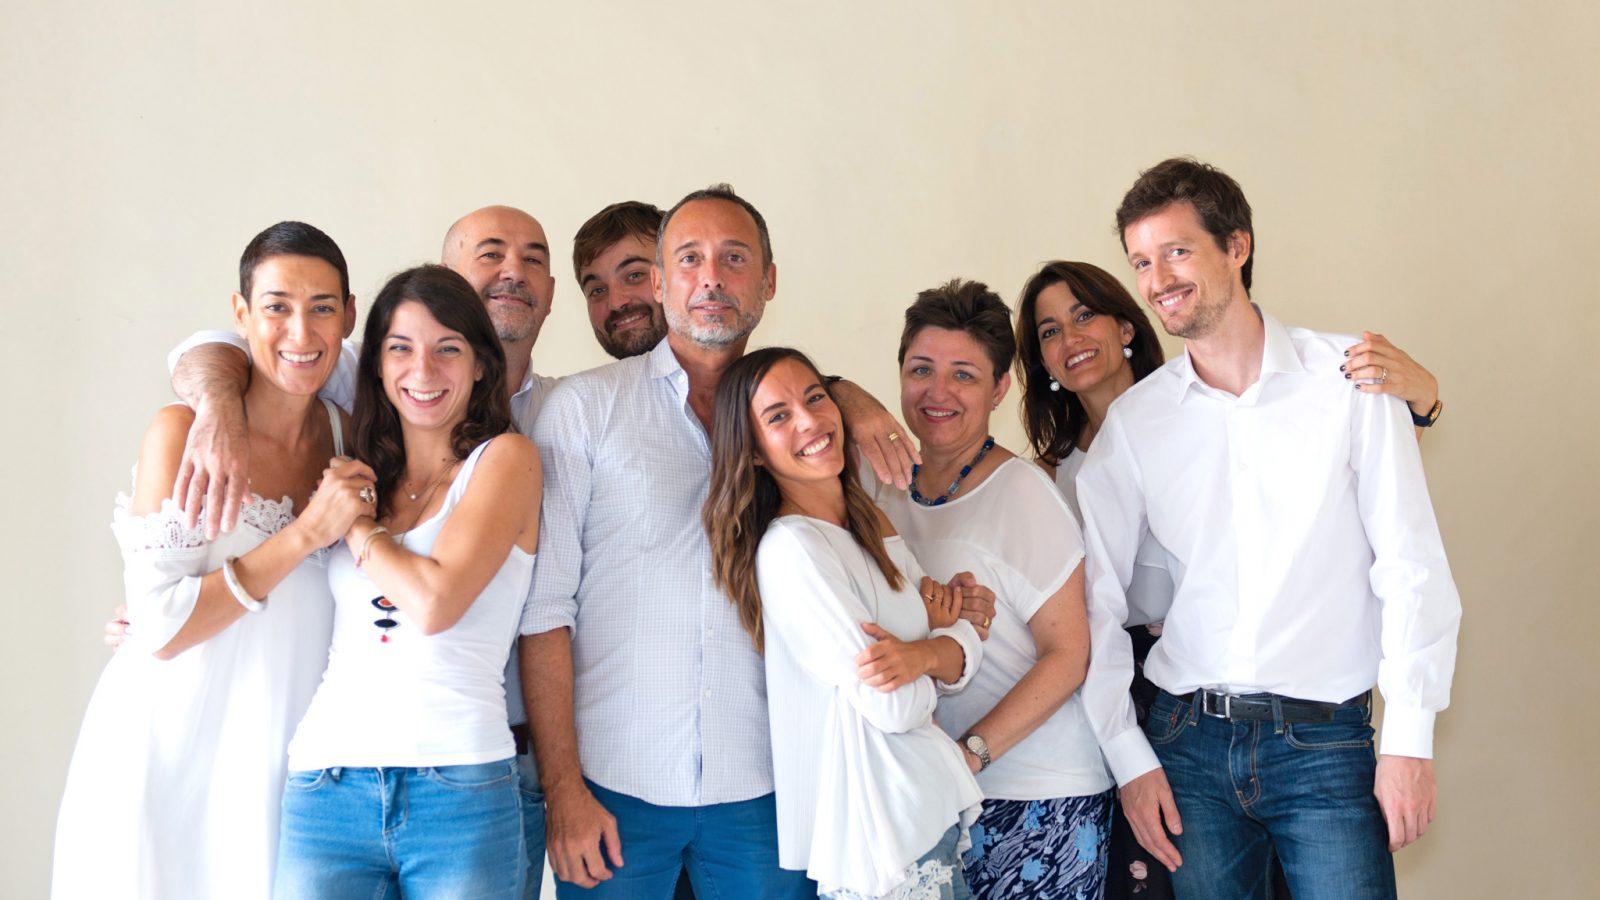 equipo de profesores de italiano